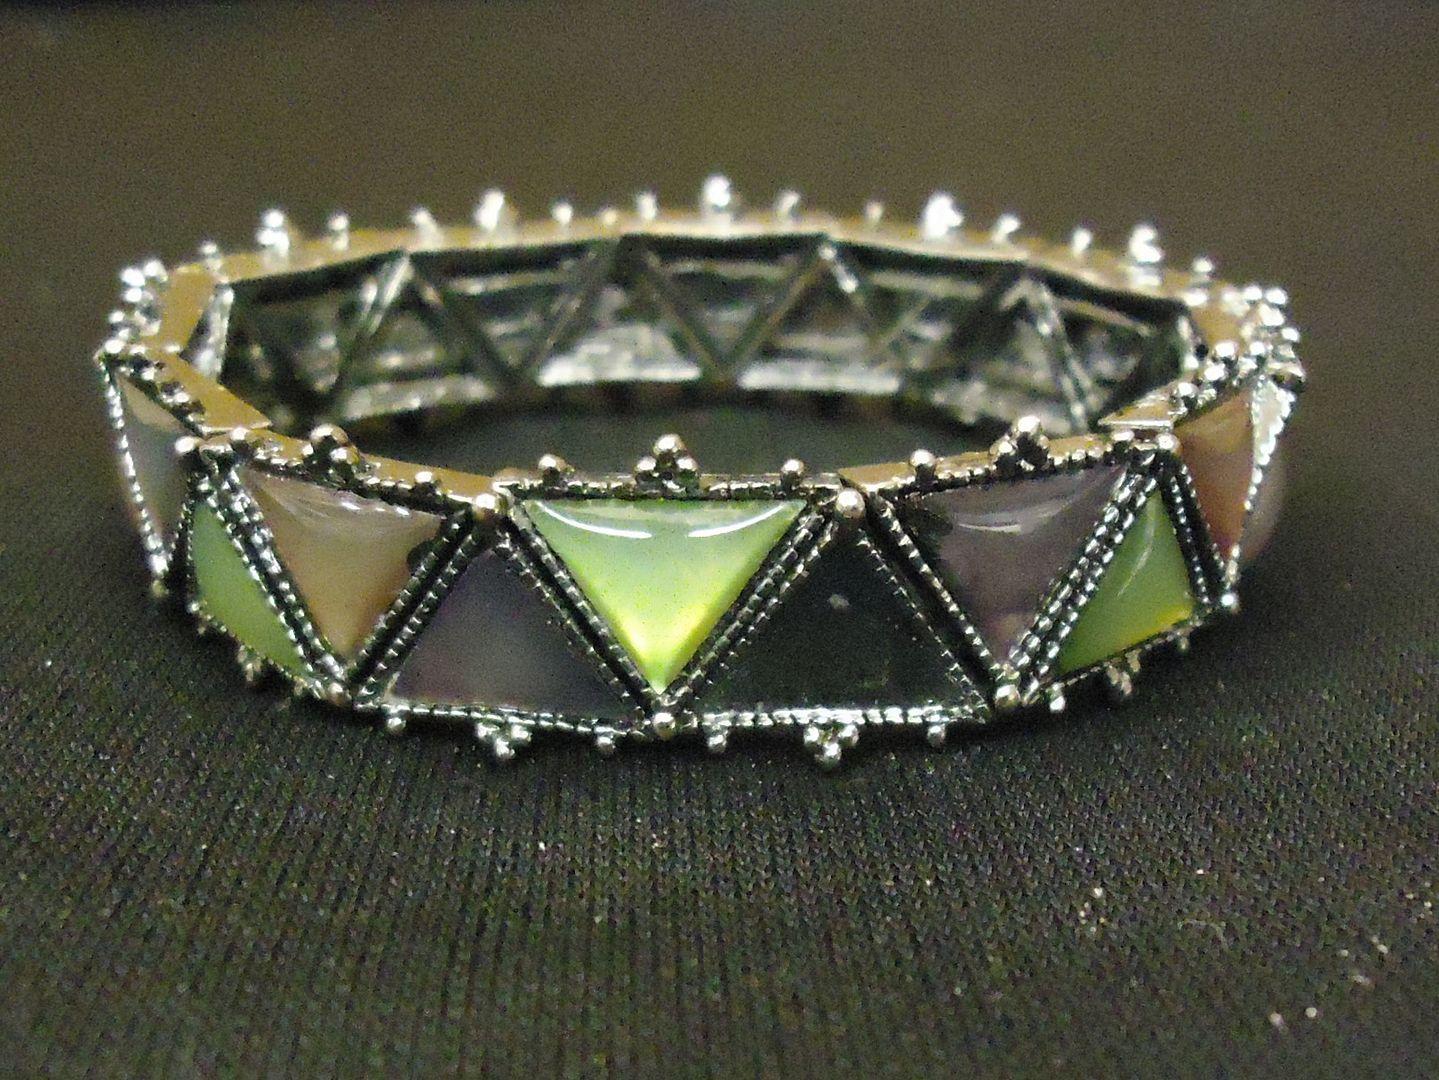 lm7410 112712-574n Designer Fashion Bracelet Chain/Link Metal Female Adult Silver/Green/Brown